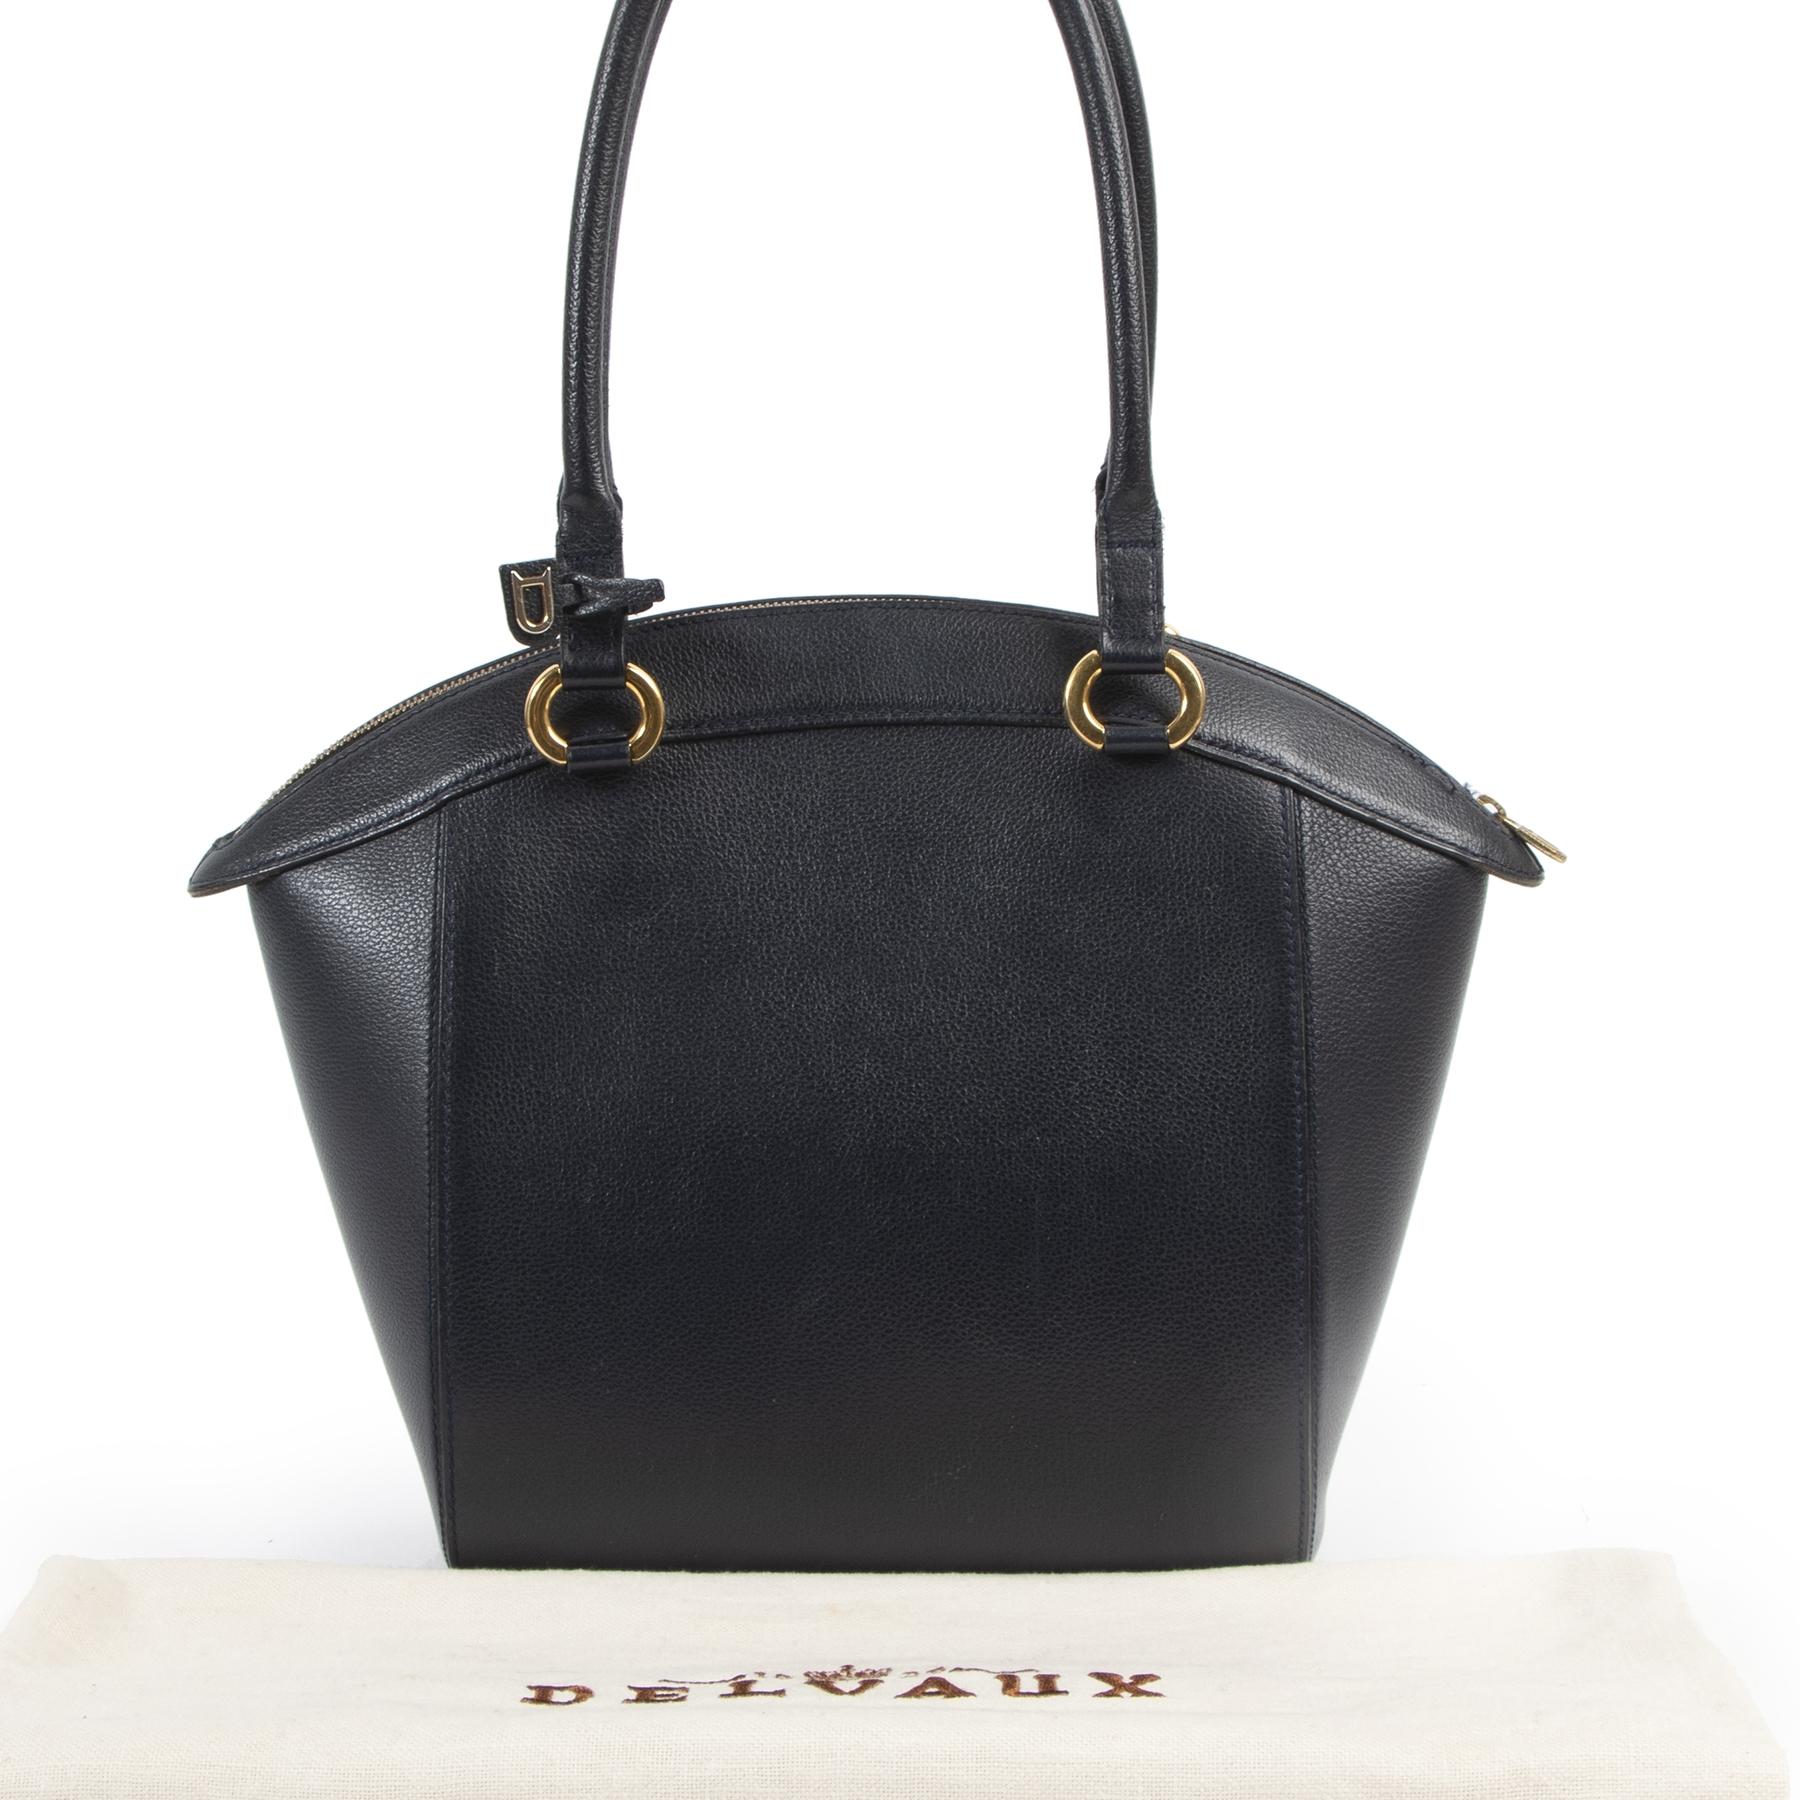 Authentic secondhand Delvaux Blue Charme Shoulder Bag designer bags fashion luxury vintage webshop safe secure online shopping